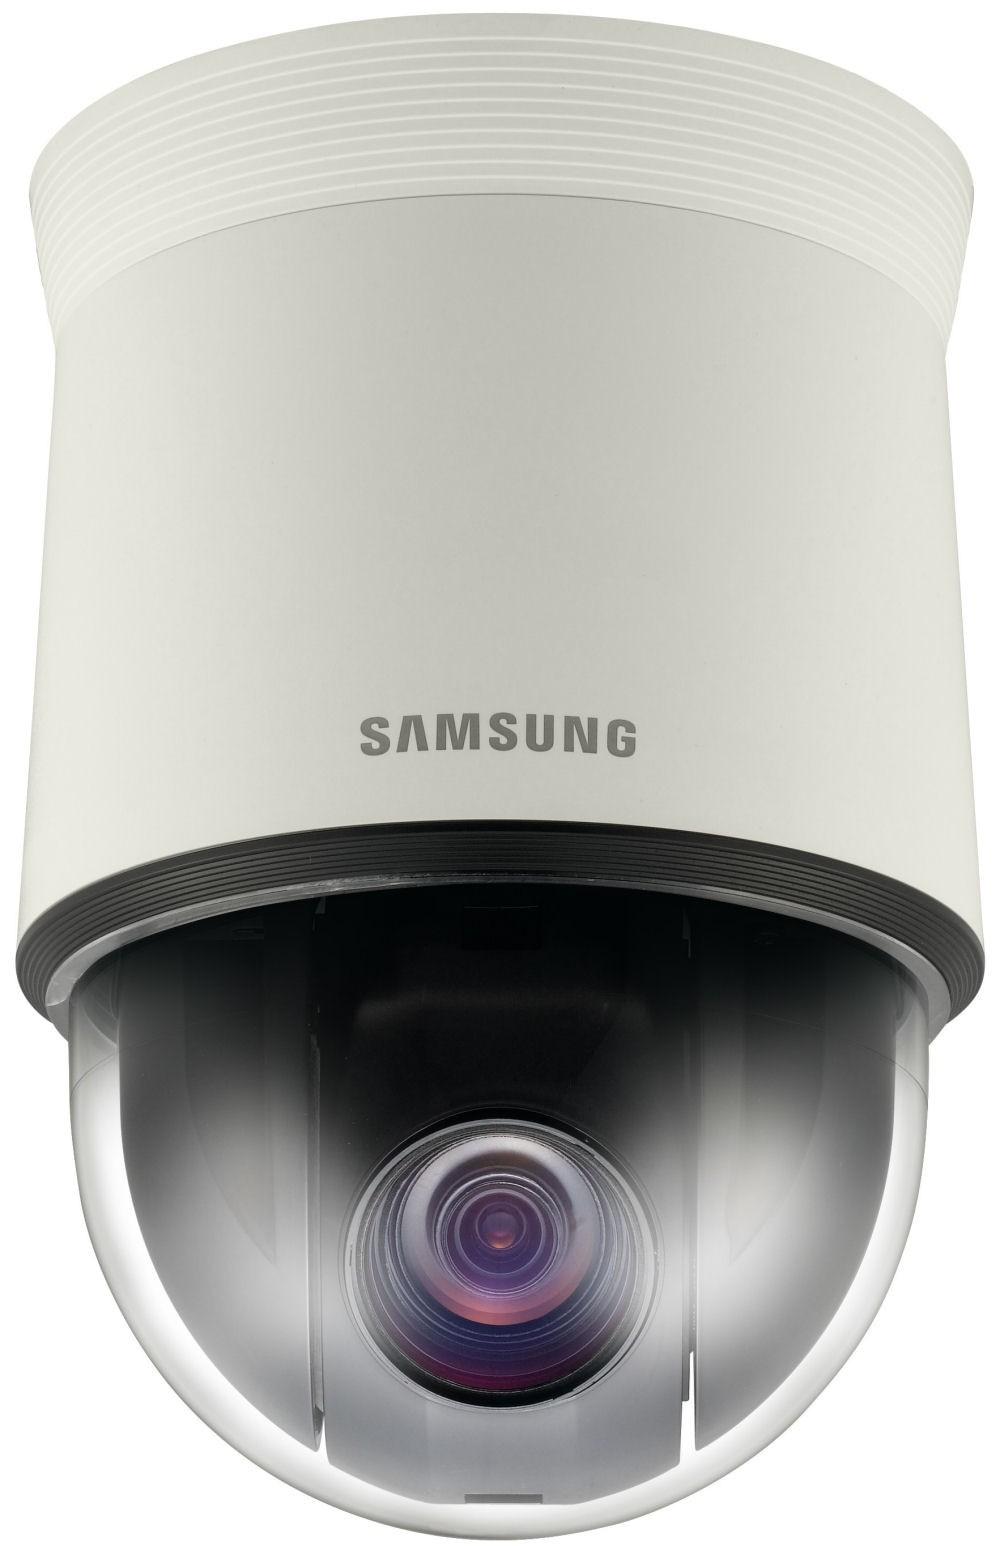 Samsung SCP3371P 37x High Resolution WDR PTZ Dome Camera